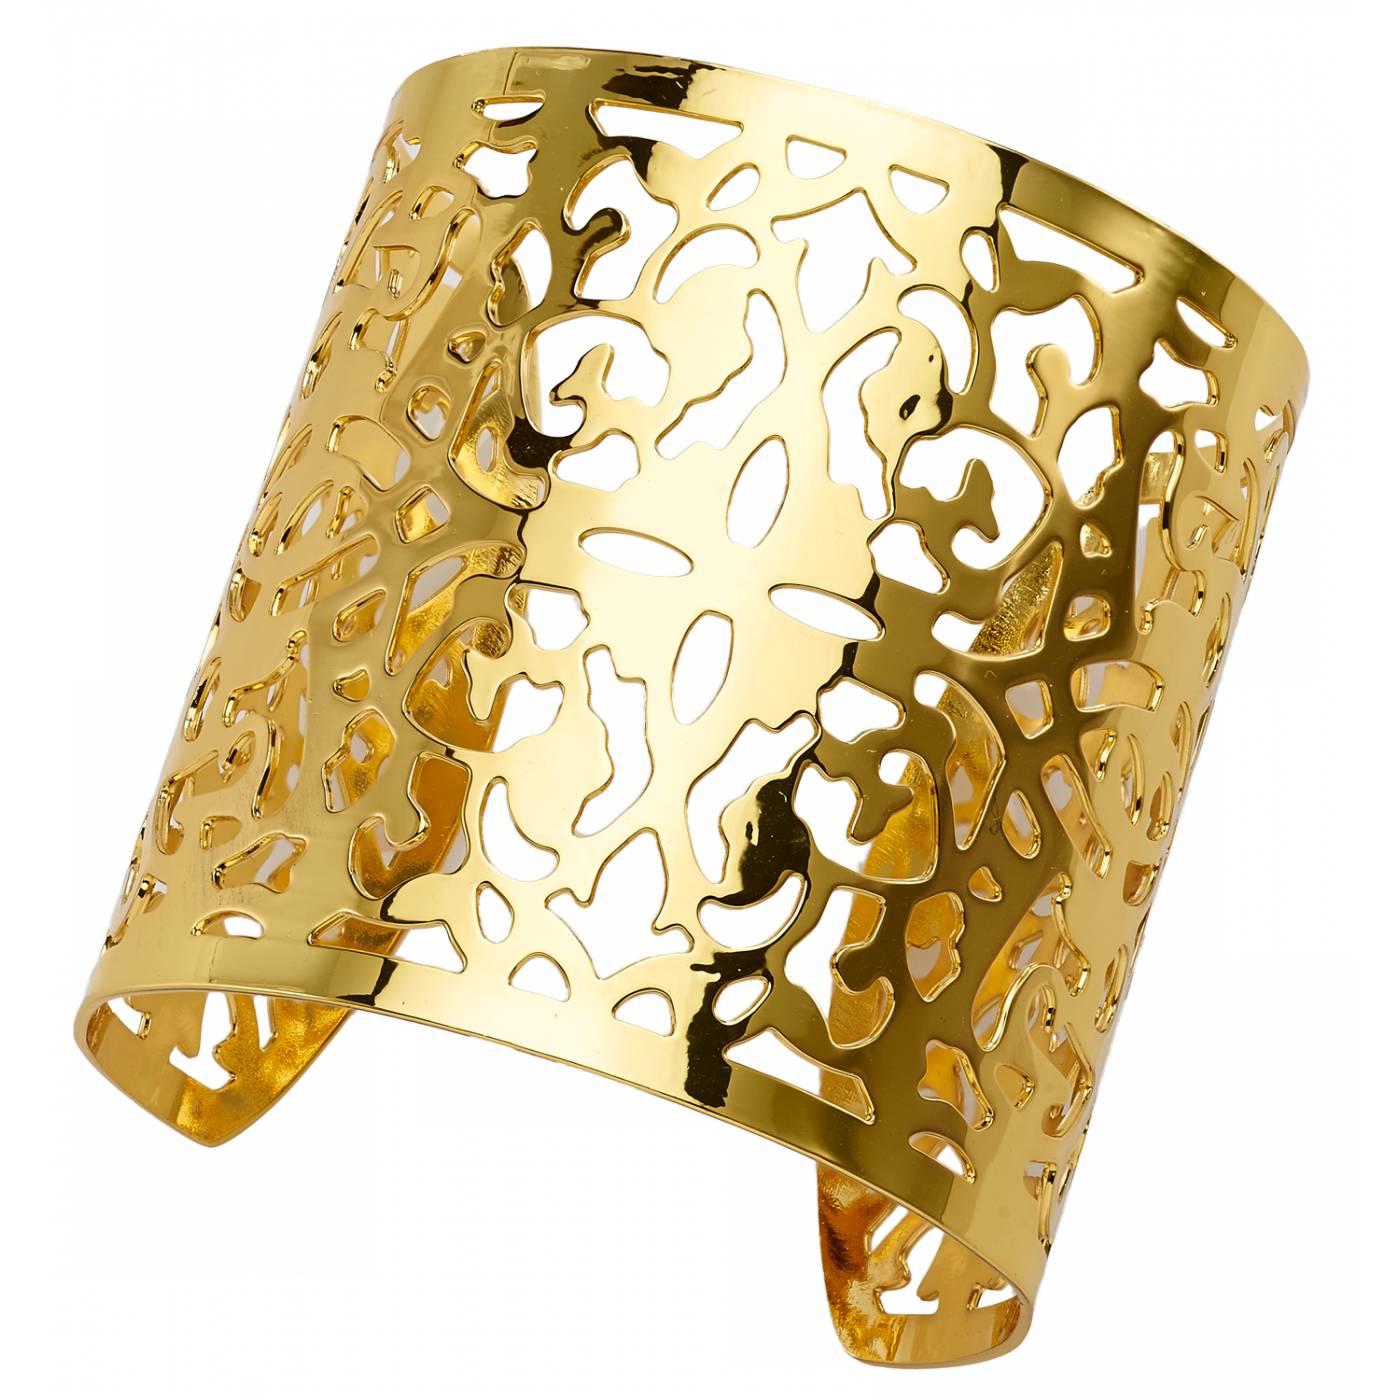 manchette femme arabesques bronze jaune franchini. Black Bedroom Furniture Sets. Home Design Ideas